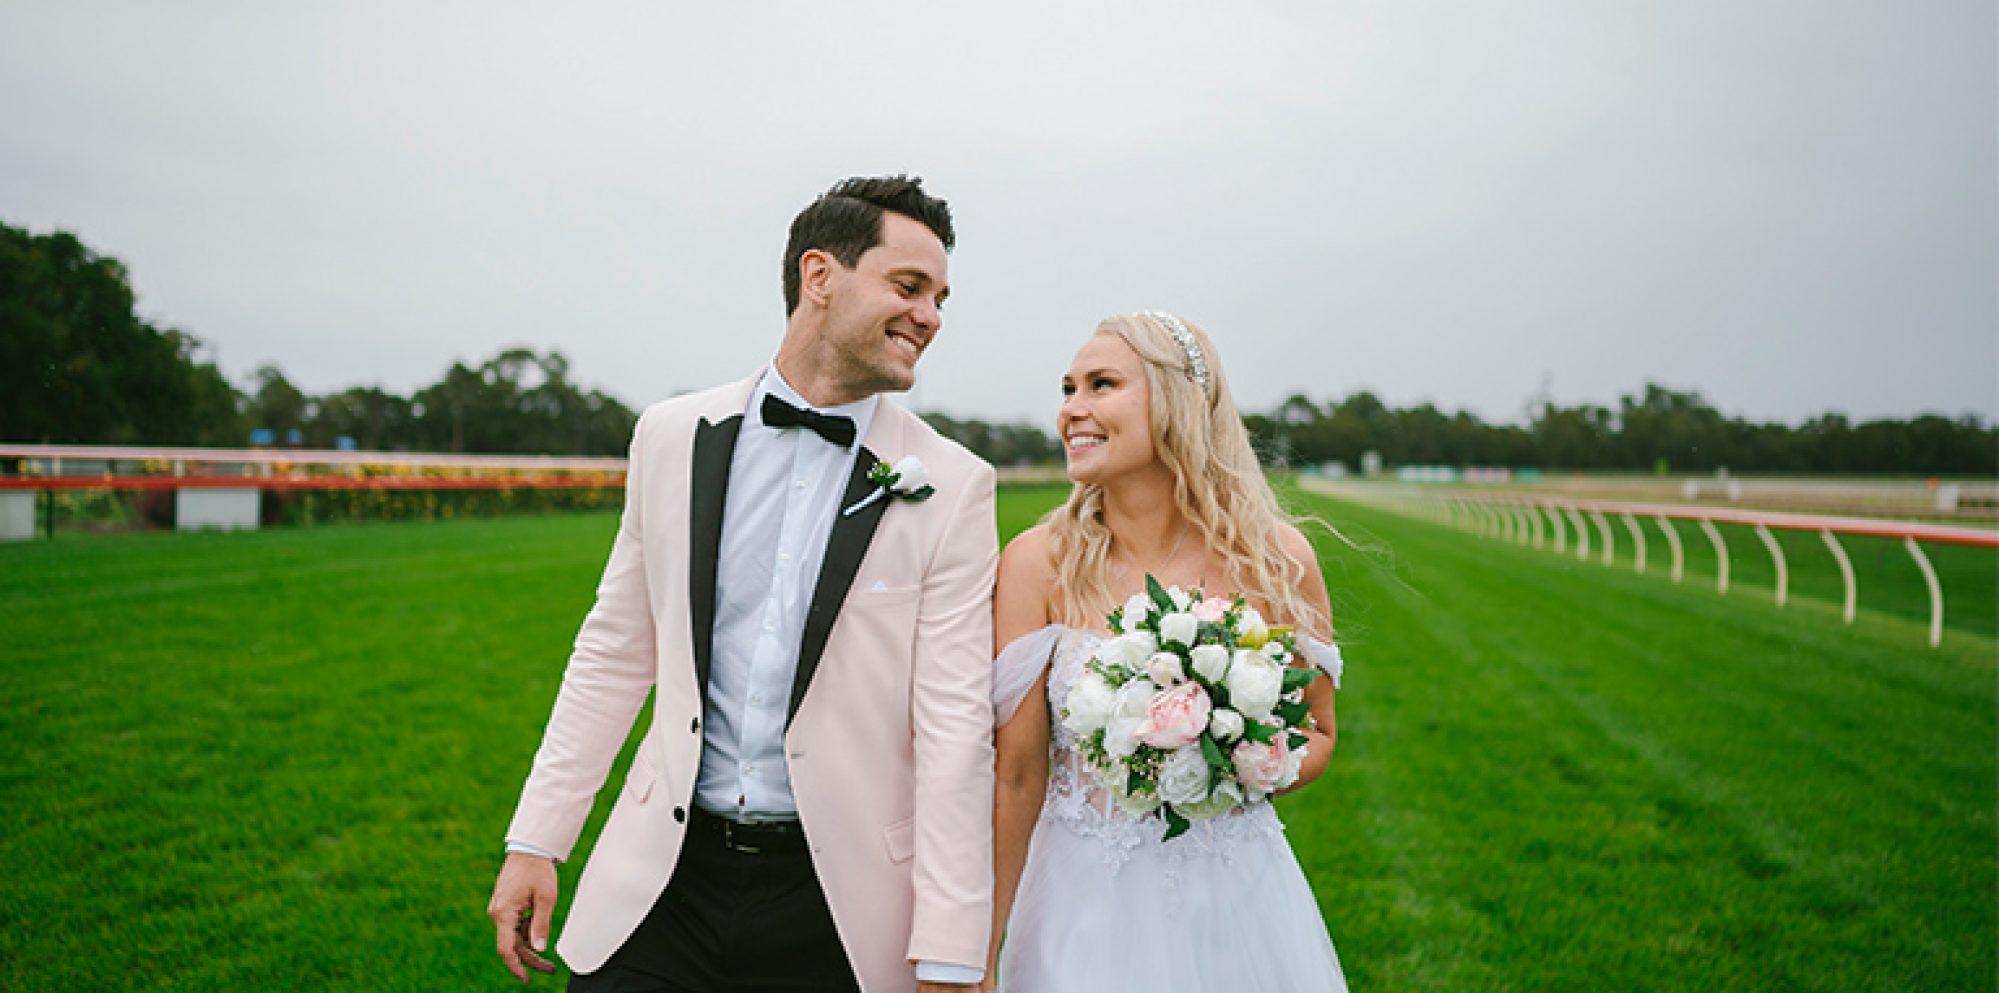 Rhiannon & andrew wedding photography @ bendigo racecourse